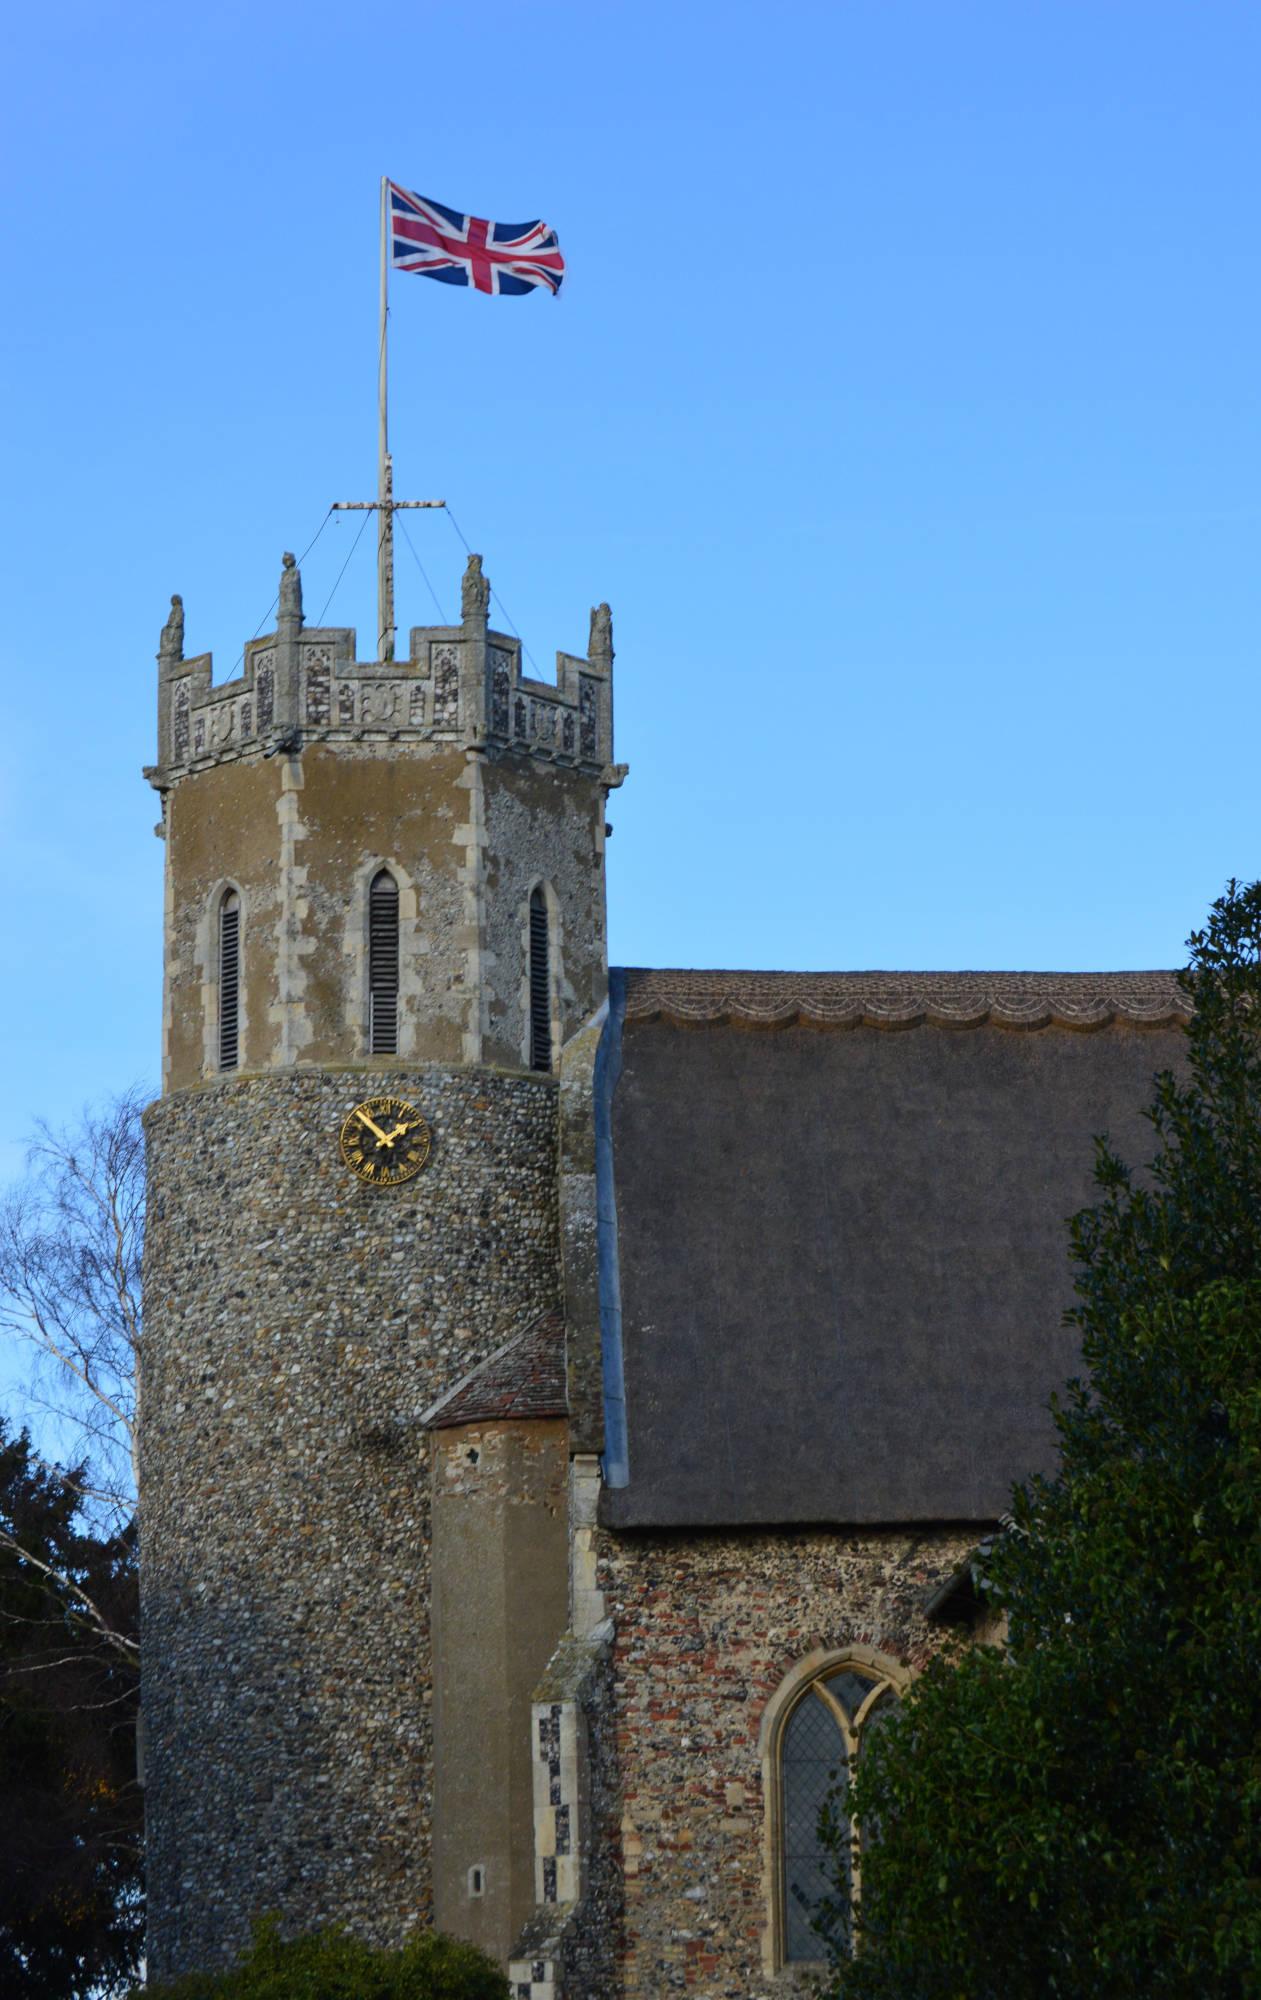 Sir Nikolaus Pevsner Architectural Guides Norman Saxon Churches of England